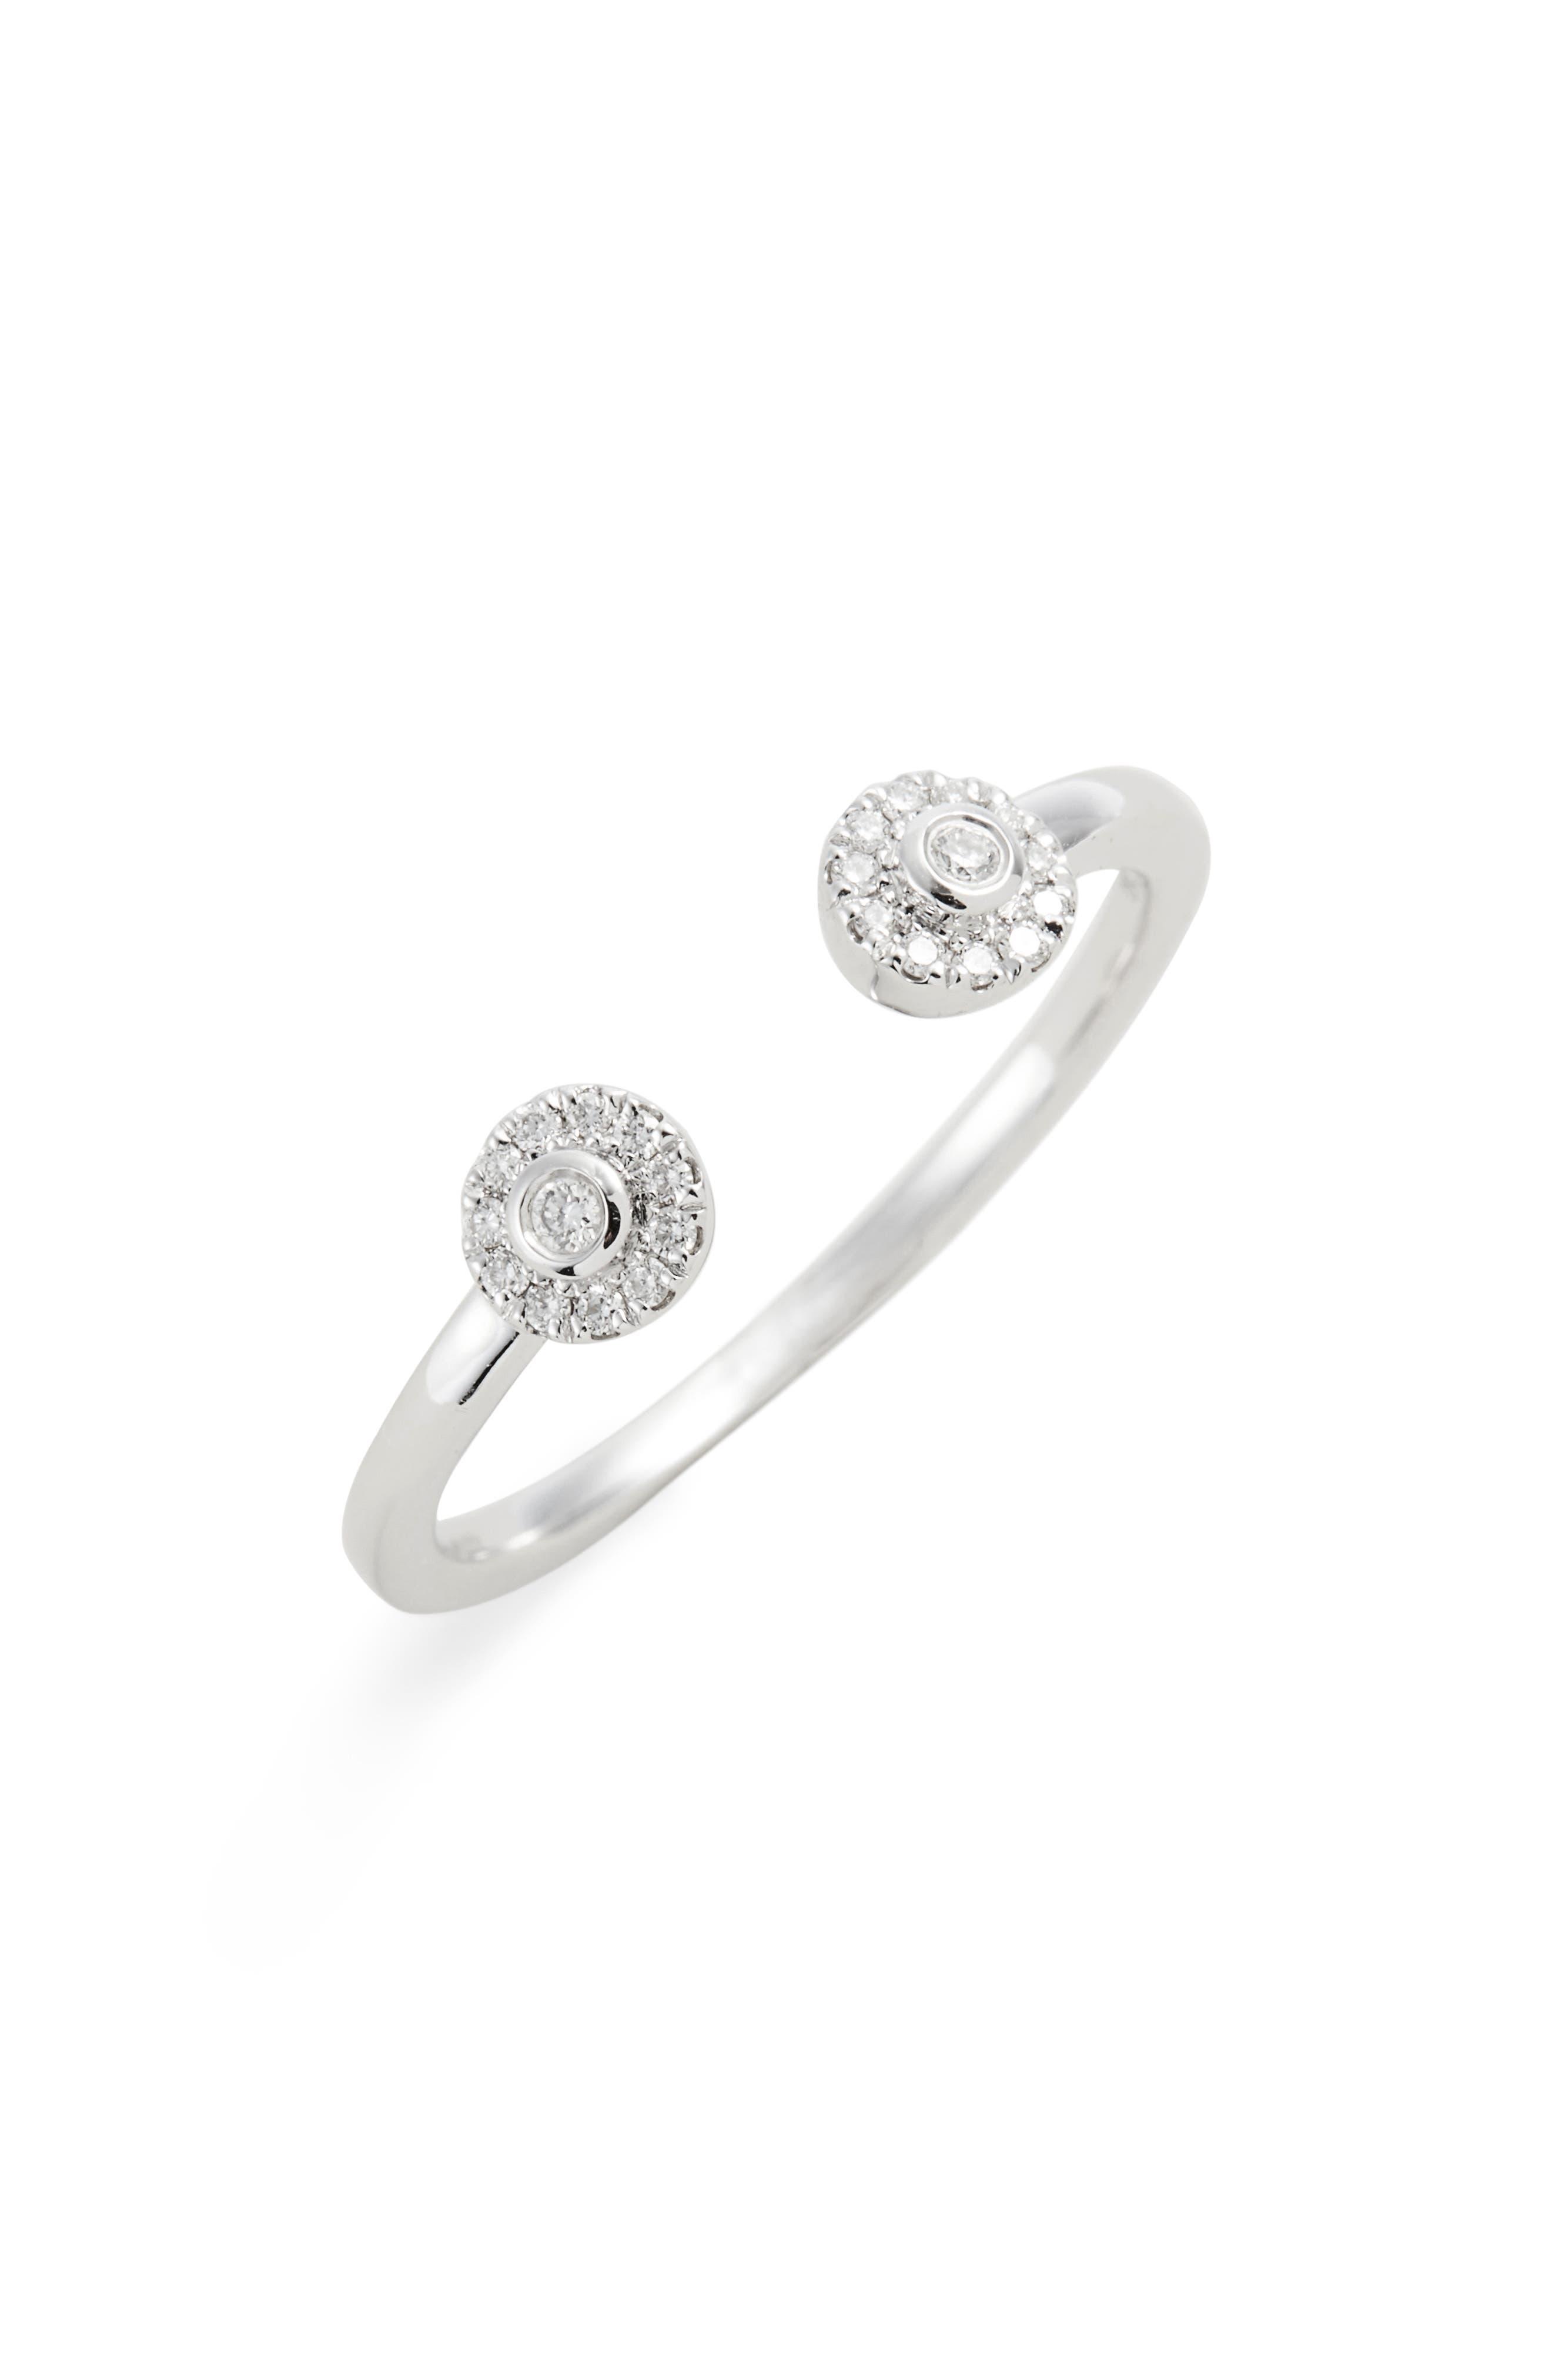 Dana Rebecca Designs Lauren Joy Open Diamond Ring